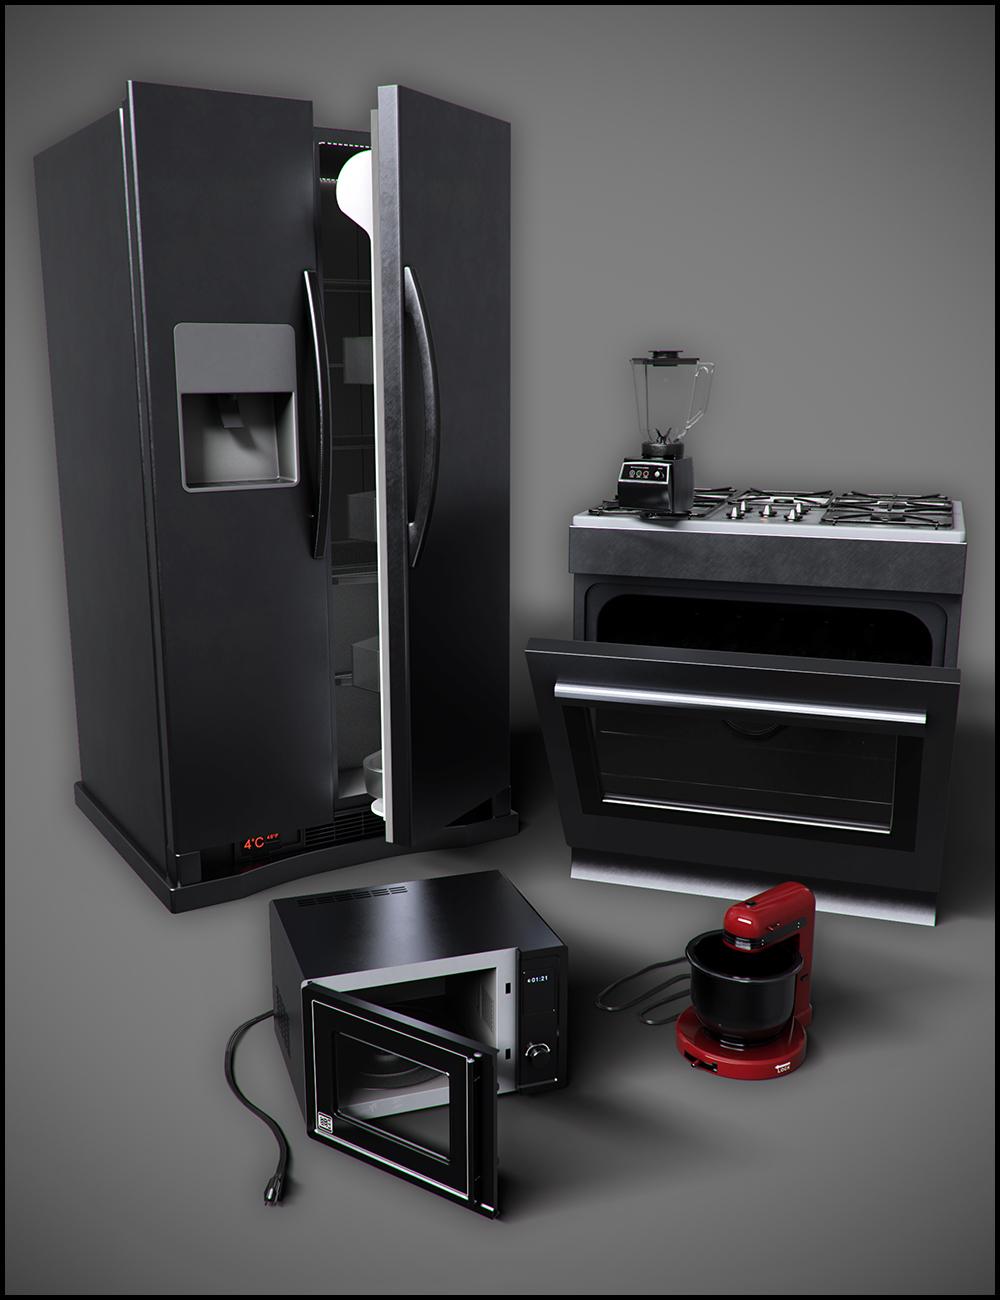 Misc. Kitchen Appliances